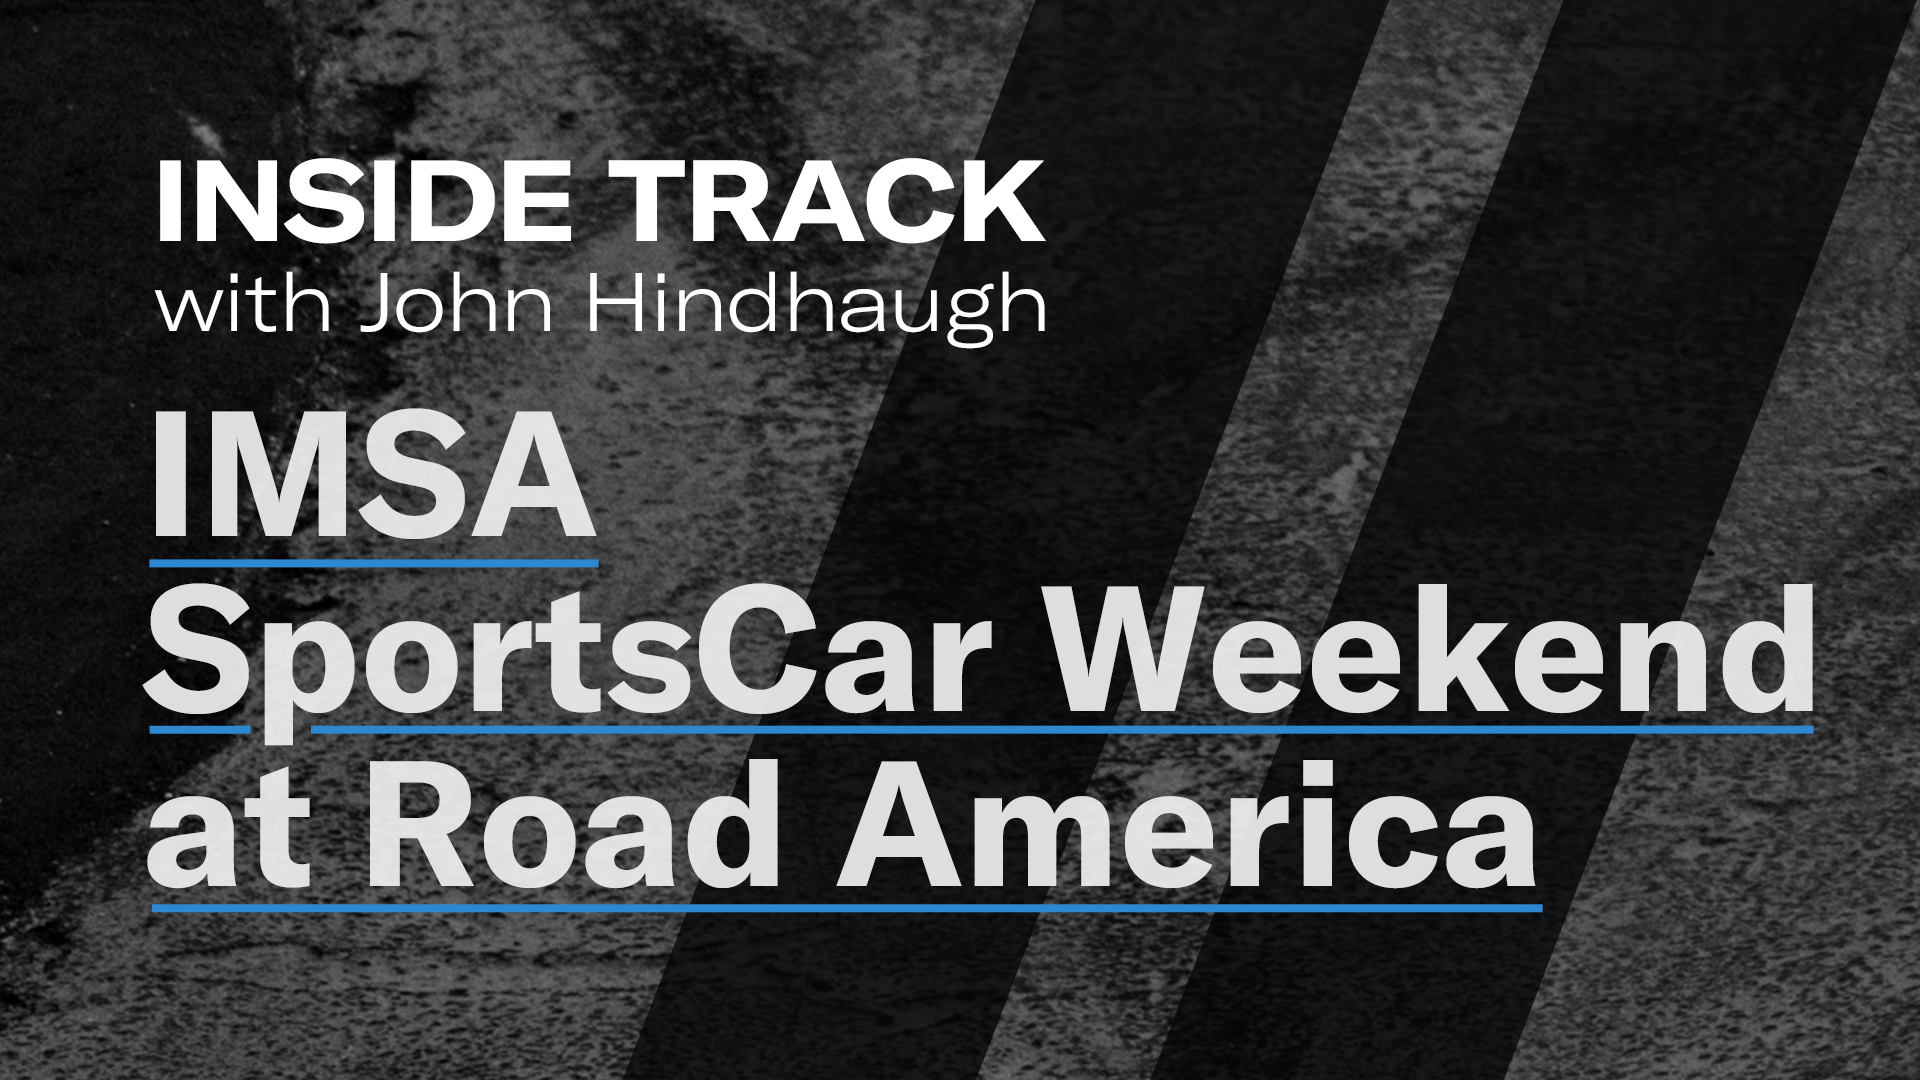 IMSA Sportscar Weekend at Road America Inside Track logo